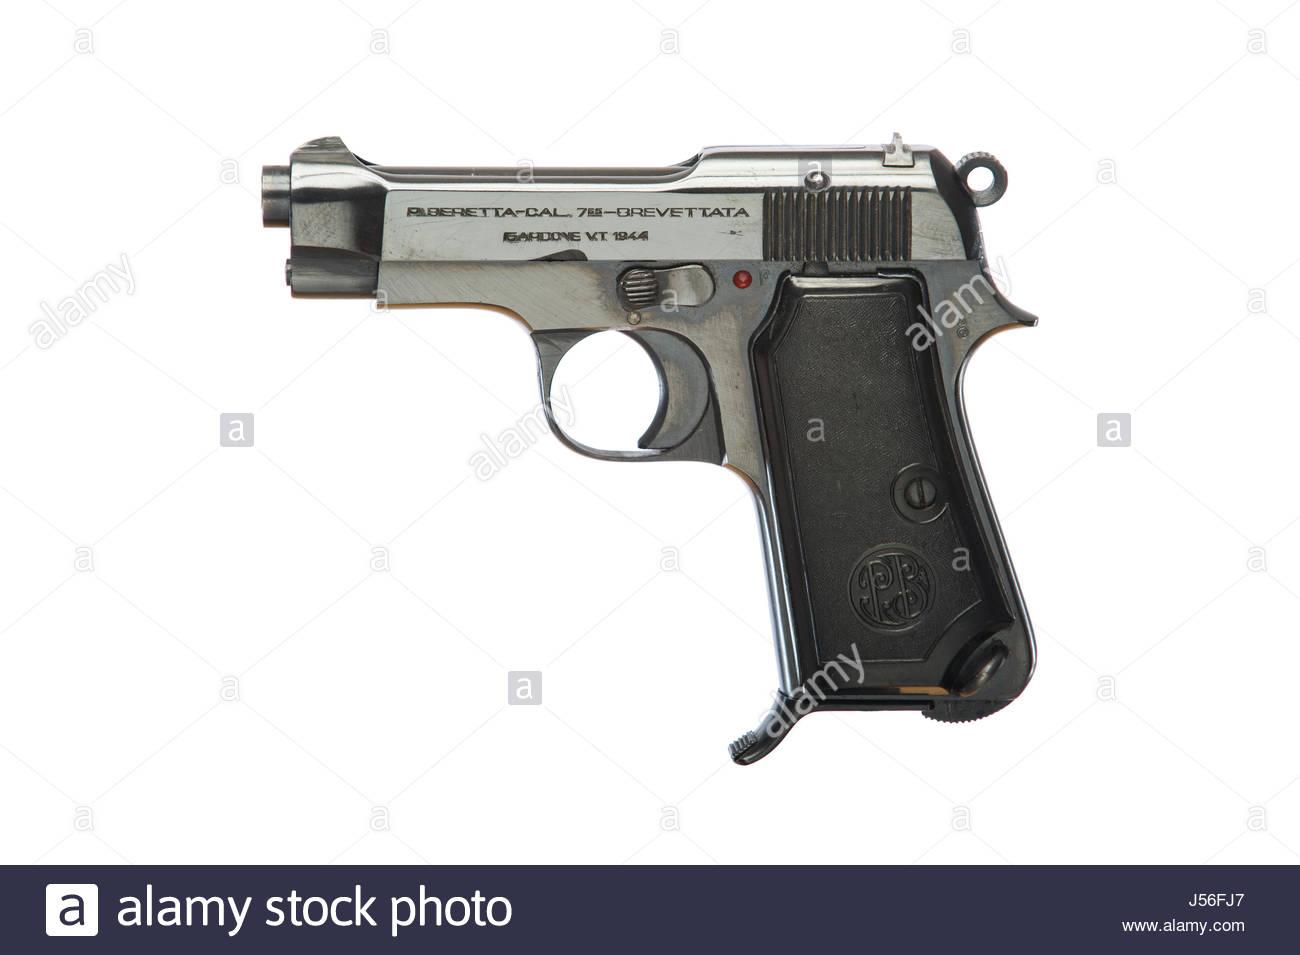 P Beretta 765-Brevettat Model-1934, .32 caliber automatic pistol, captured